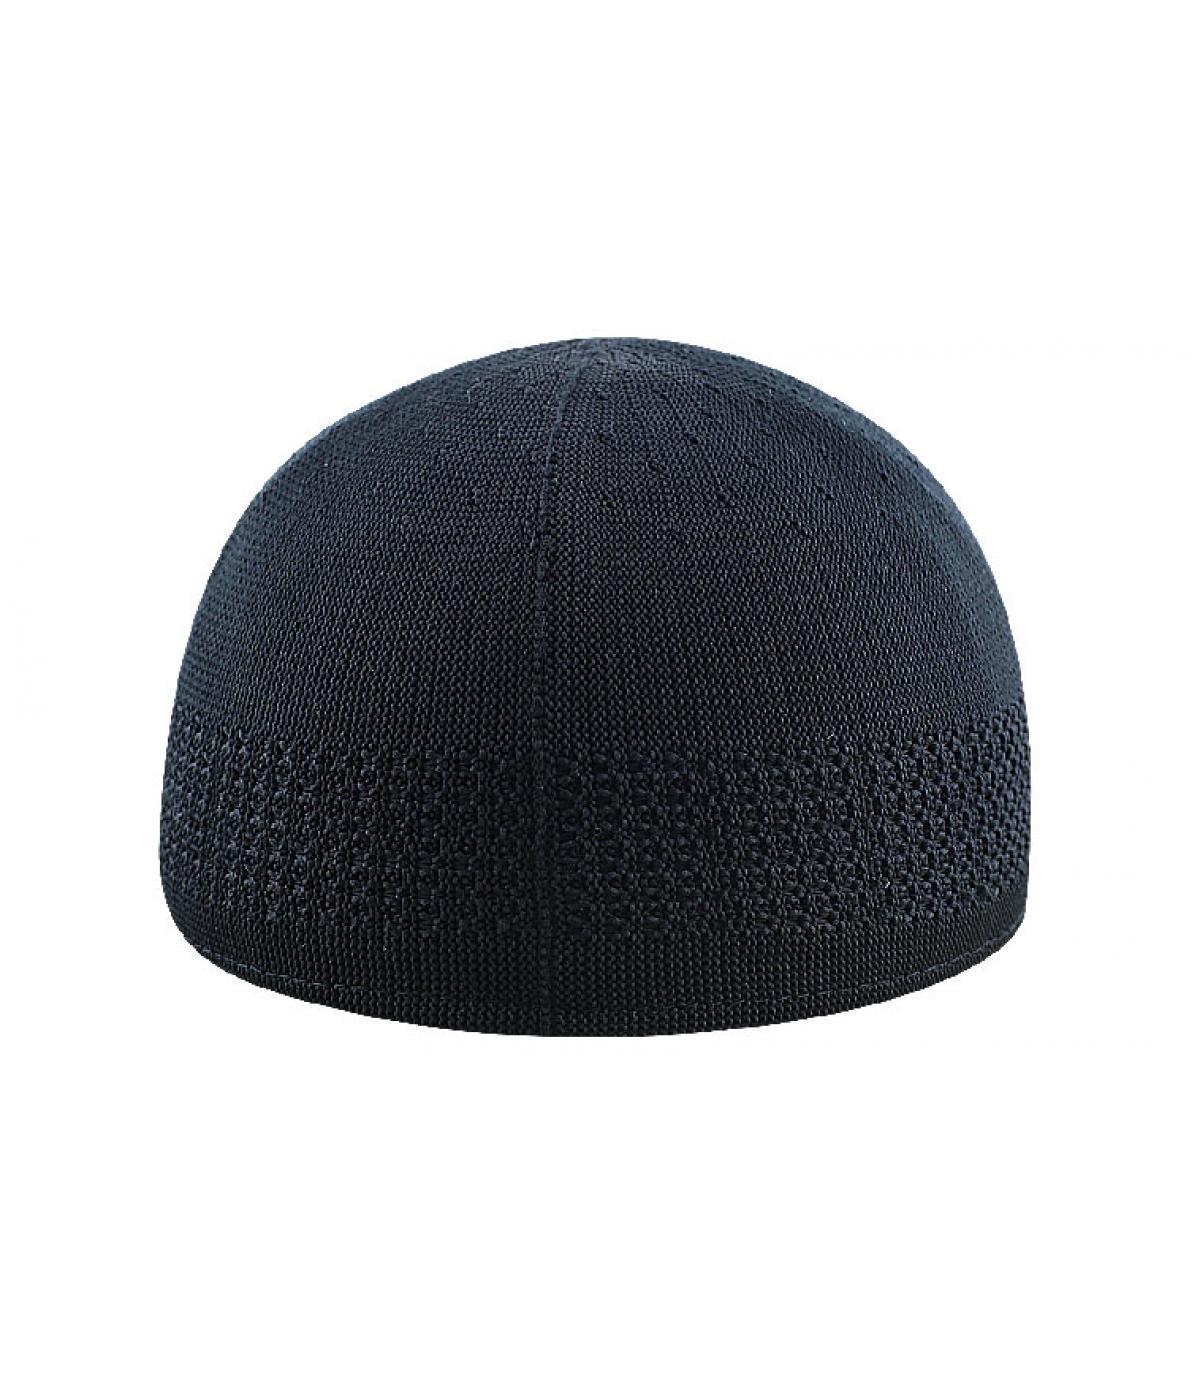 Kangol black trucker cap - Tropic ventair spacecap black by Kangol. 0243799a7e9d